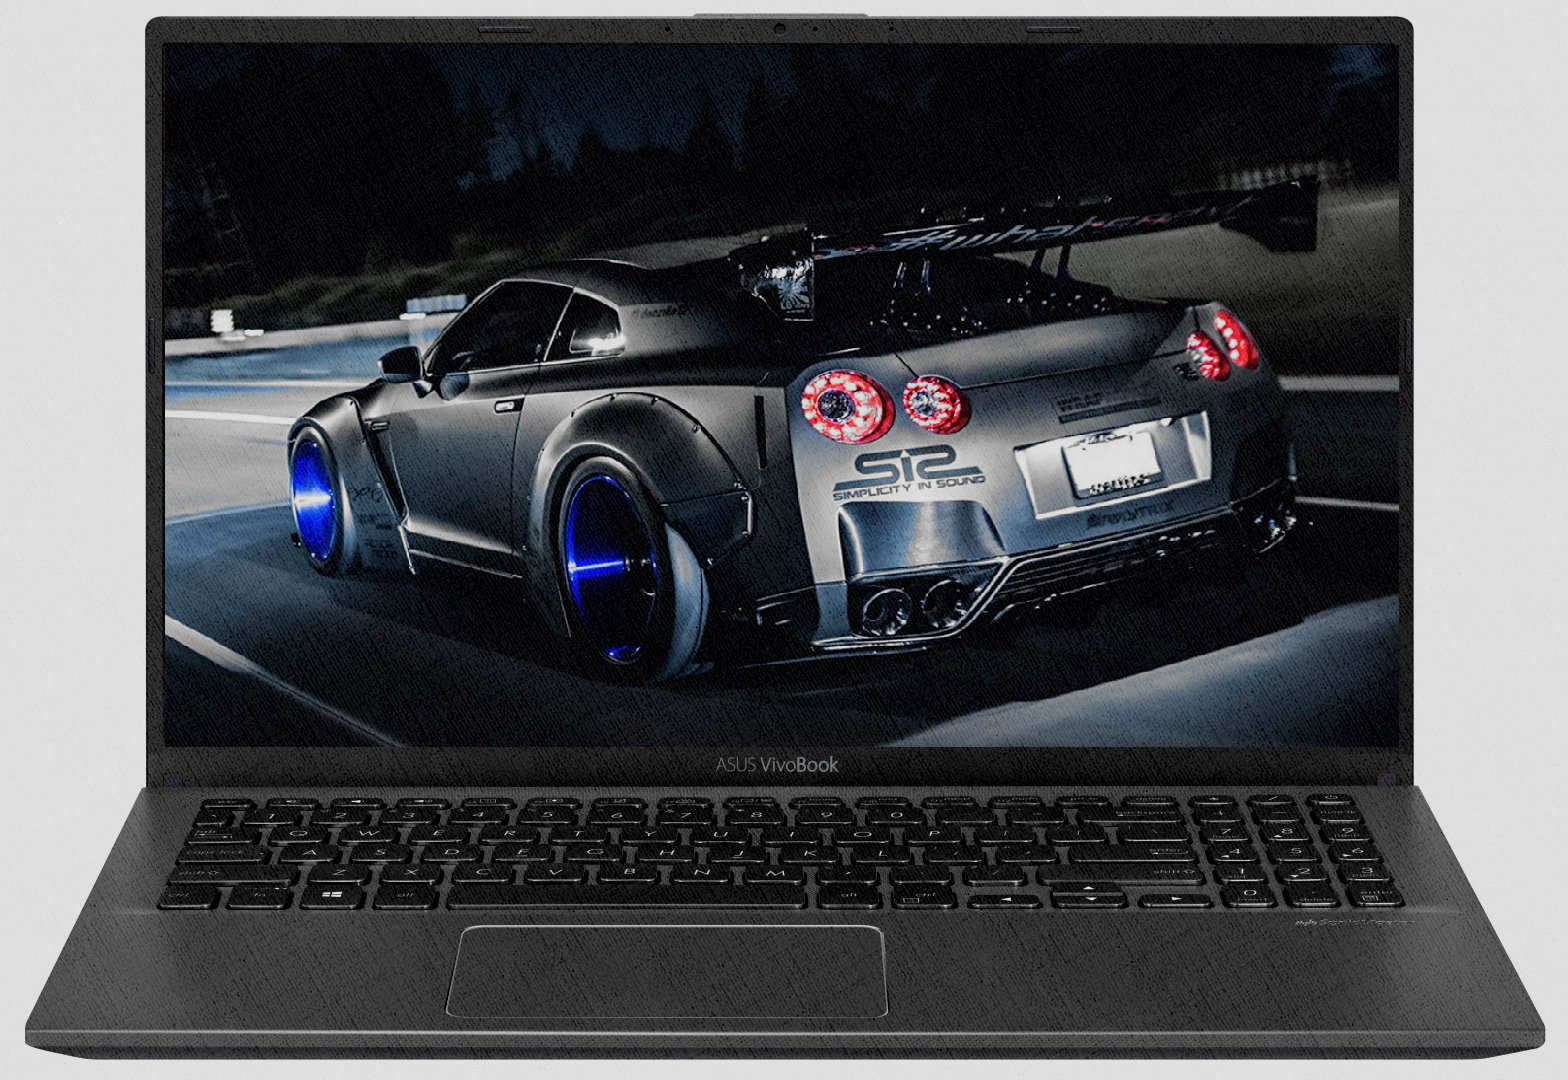 ASUS VivoBook X512UA-BQ063T Grey 90NB0K83-M04090